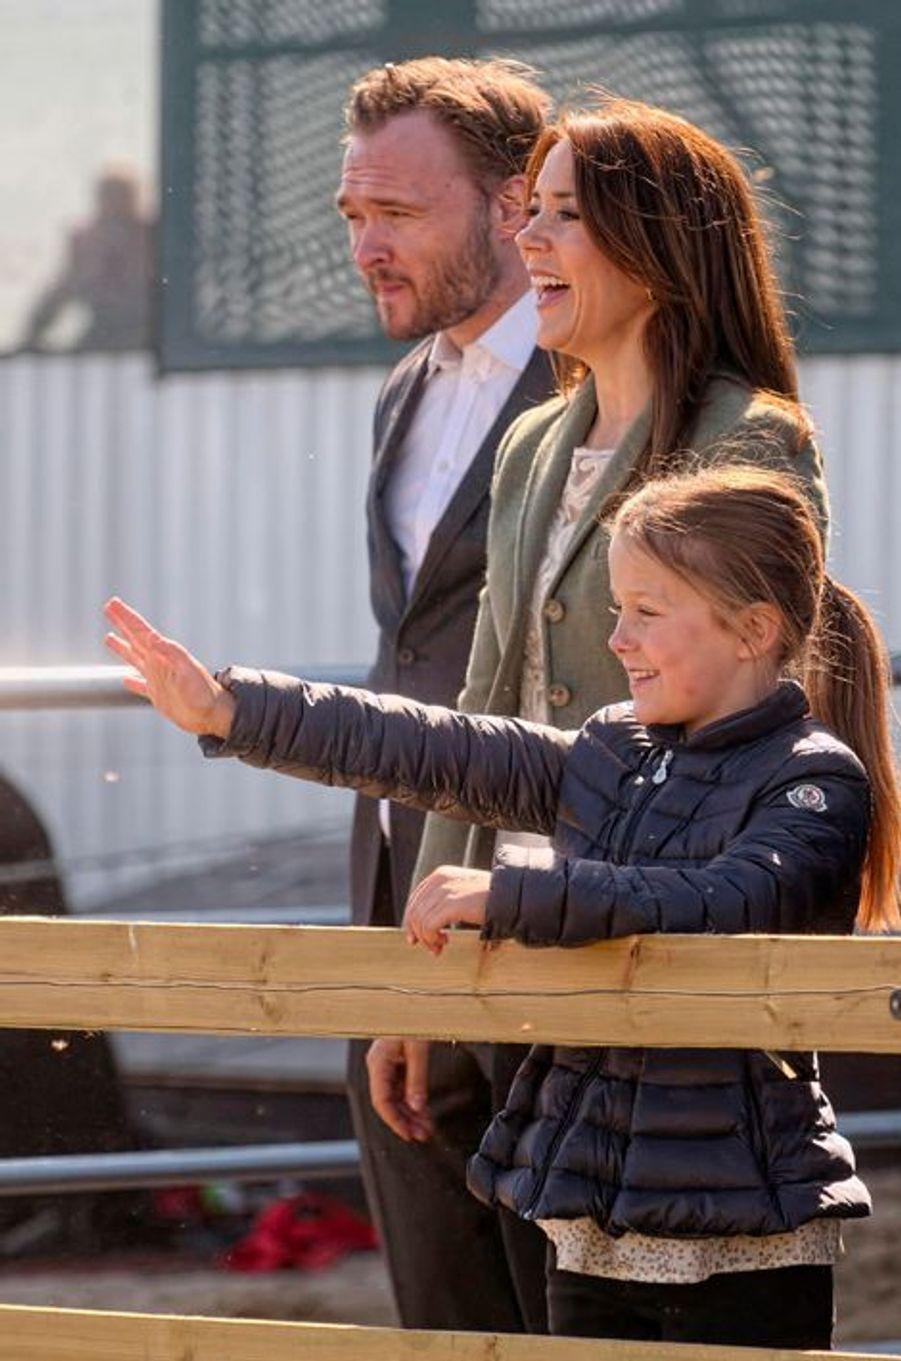 La princesse Mary de Danemark à Kirke Hyllinge, le 19 avril 2015